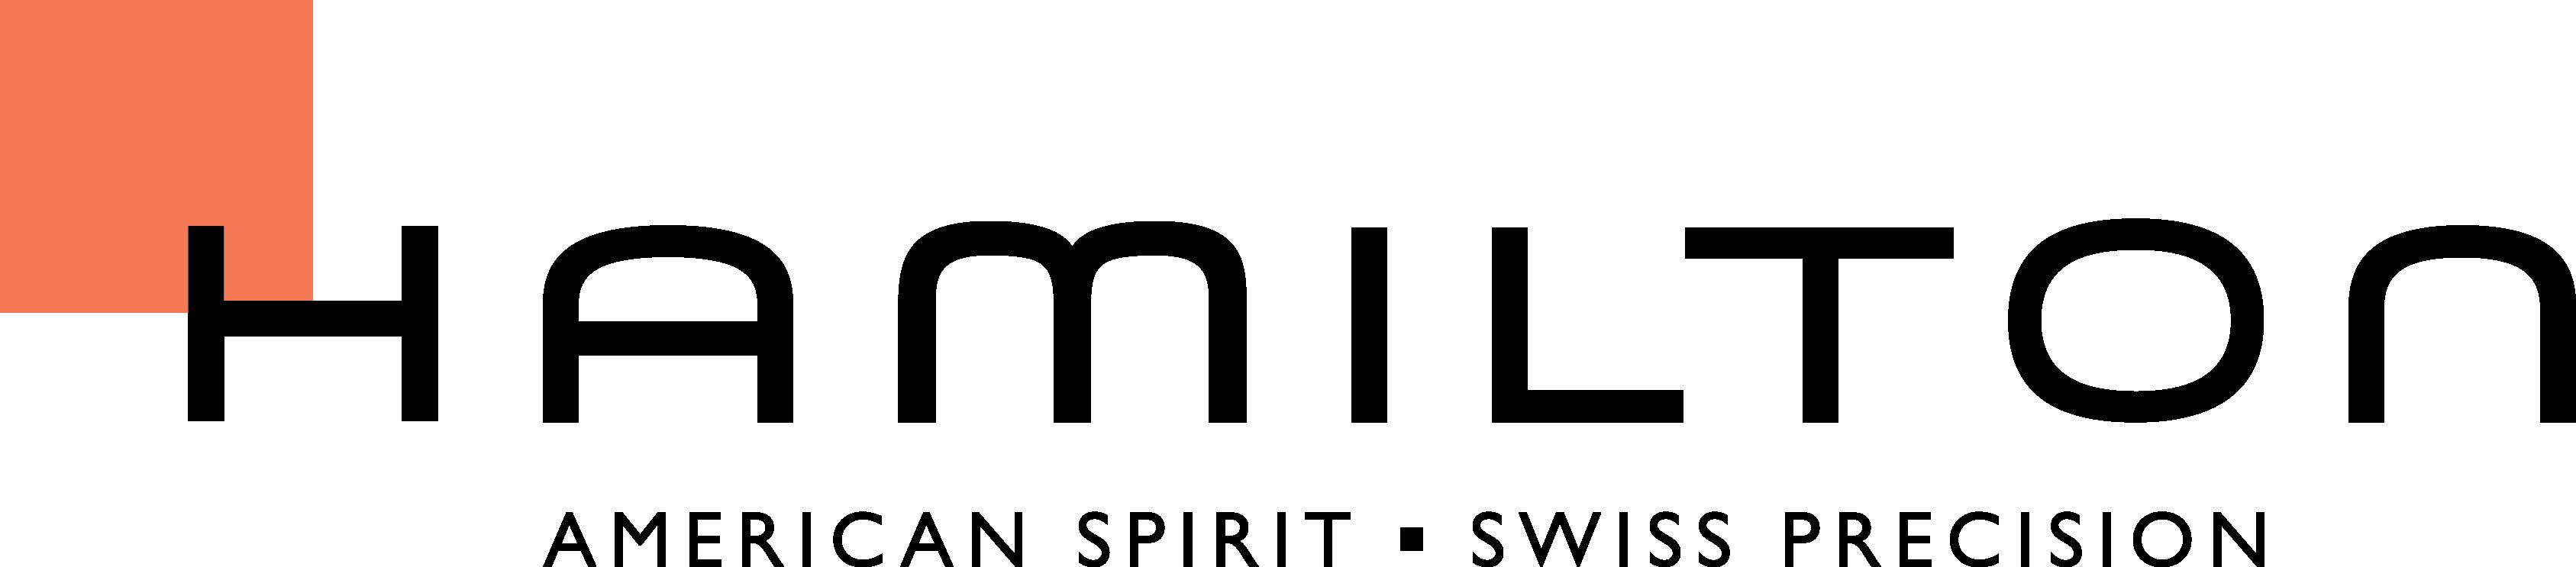 hamilton-logo-2.png